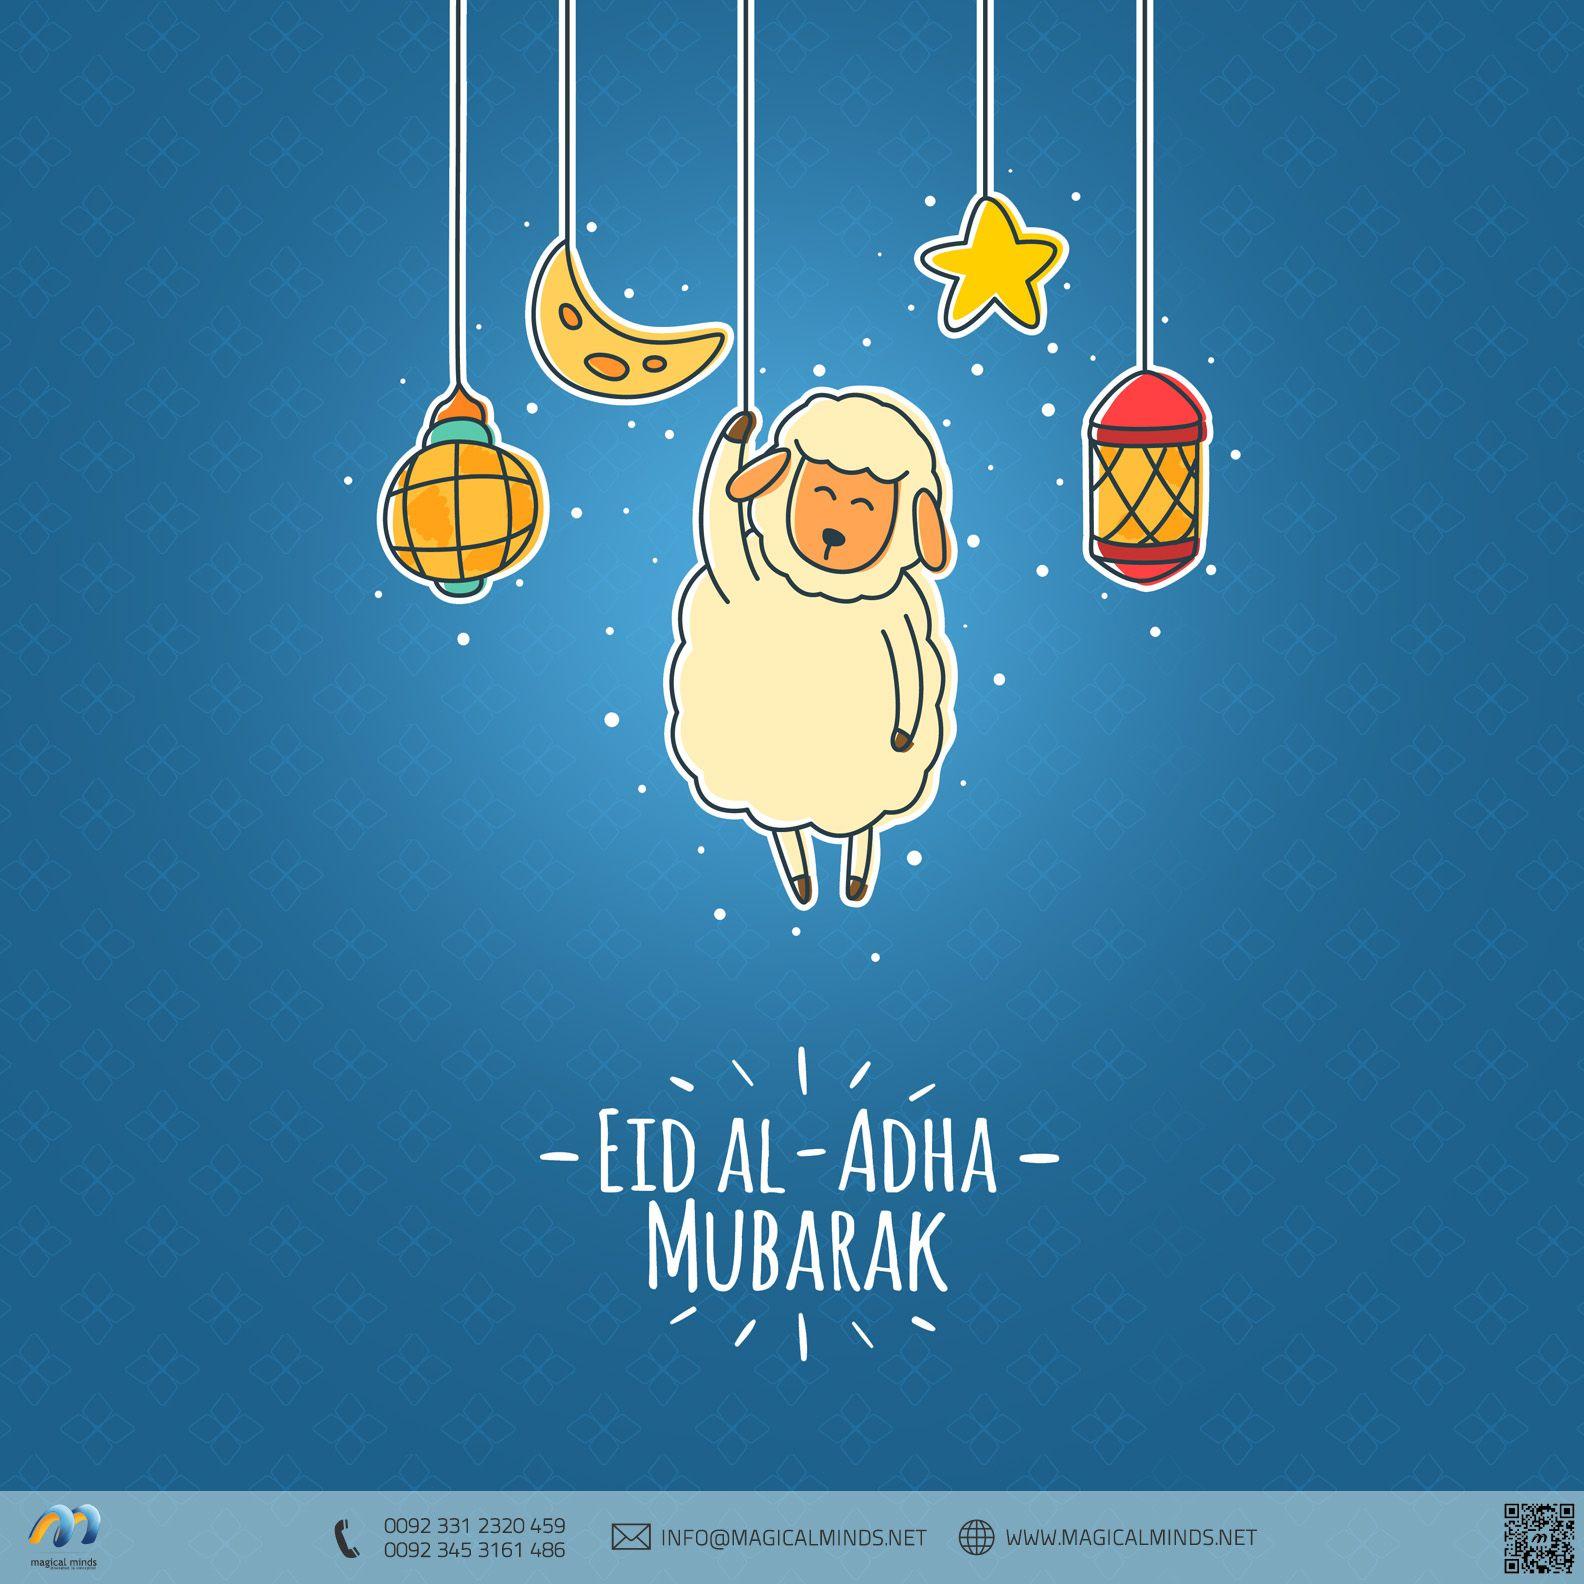 Magicalminds Wishes You Joy Happiness Peace And Prosperity On This Blessed Occasion Eid Ul Adha Mubarak Celeb Eid Al Adha Greetings Adha Card Eid Ul Adha